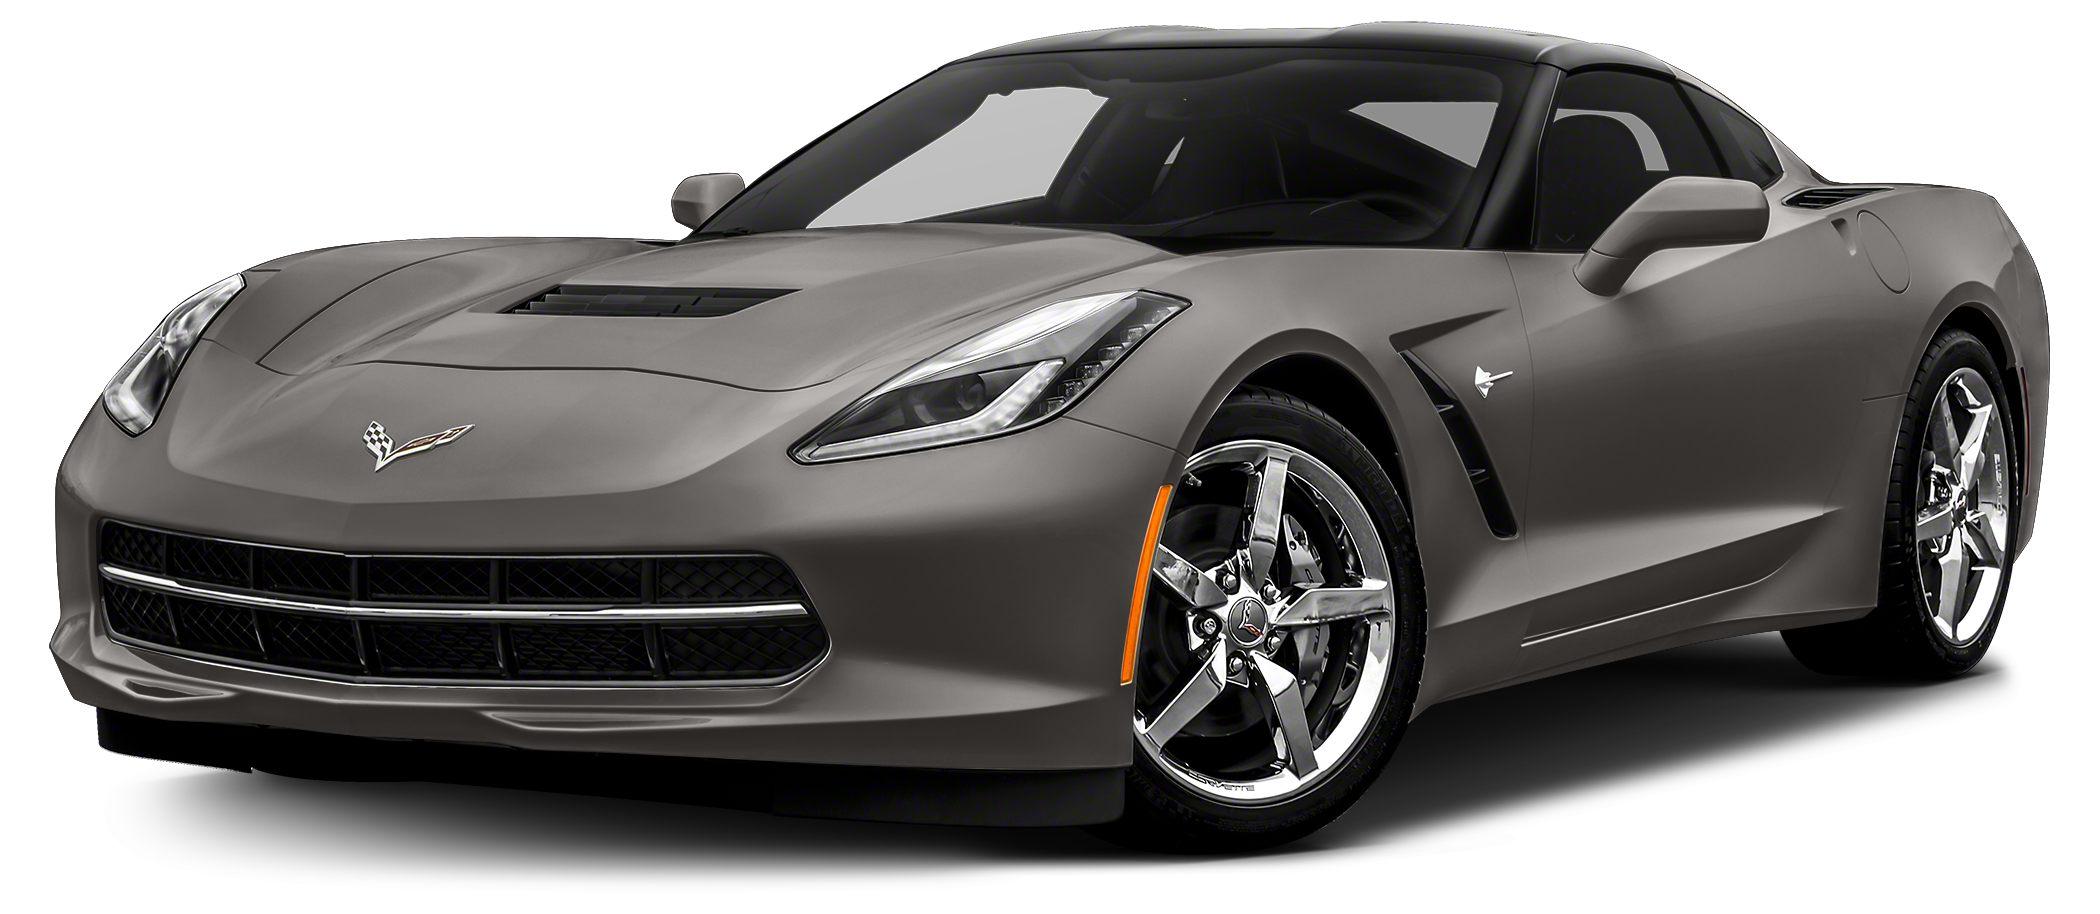 2016 Chevrolet Corvette Stingray Great color Miles 0Color Metallic Stock 121375 VIN 1G1YB2D